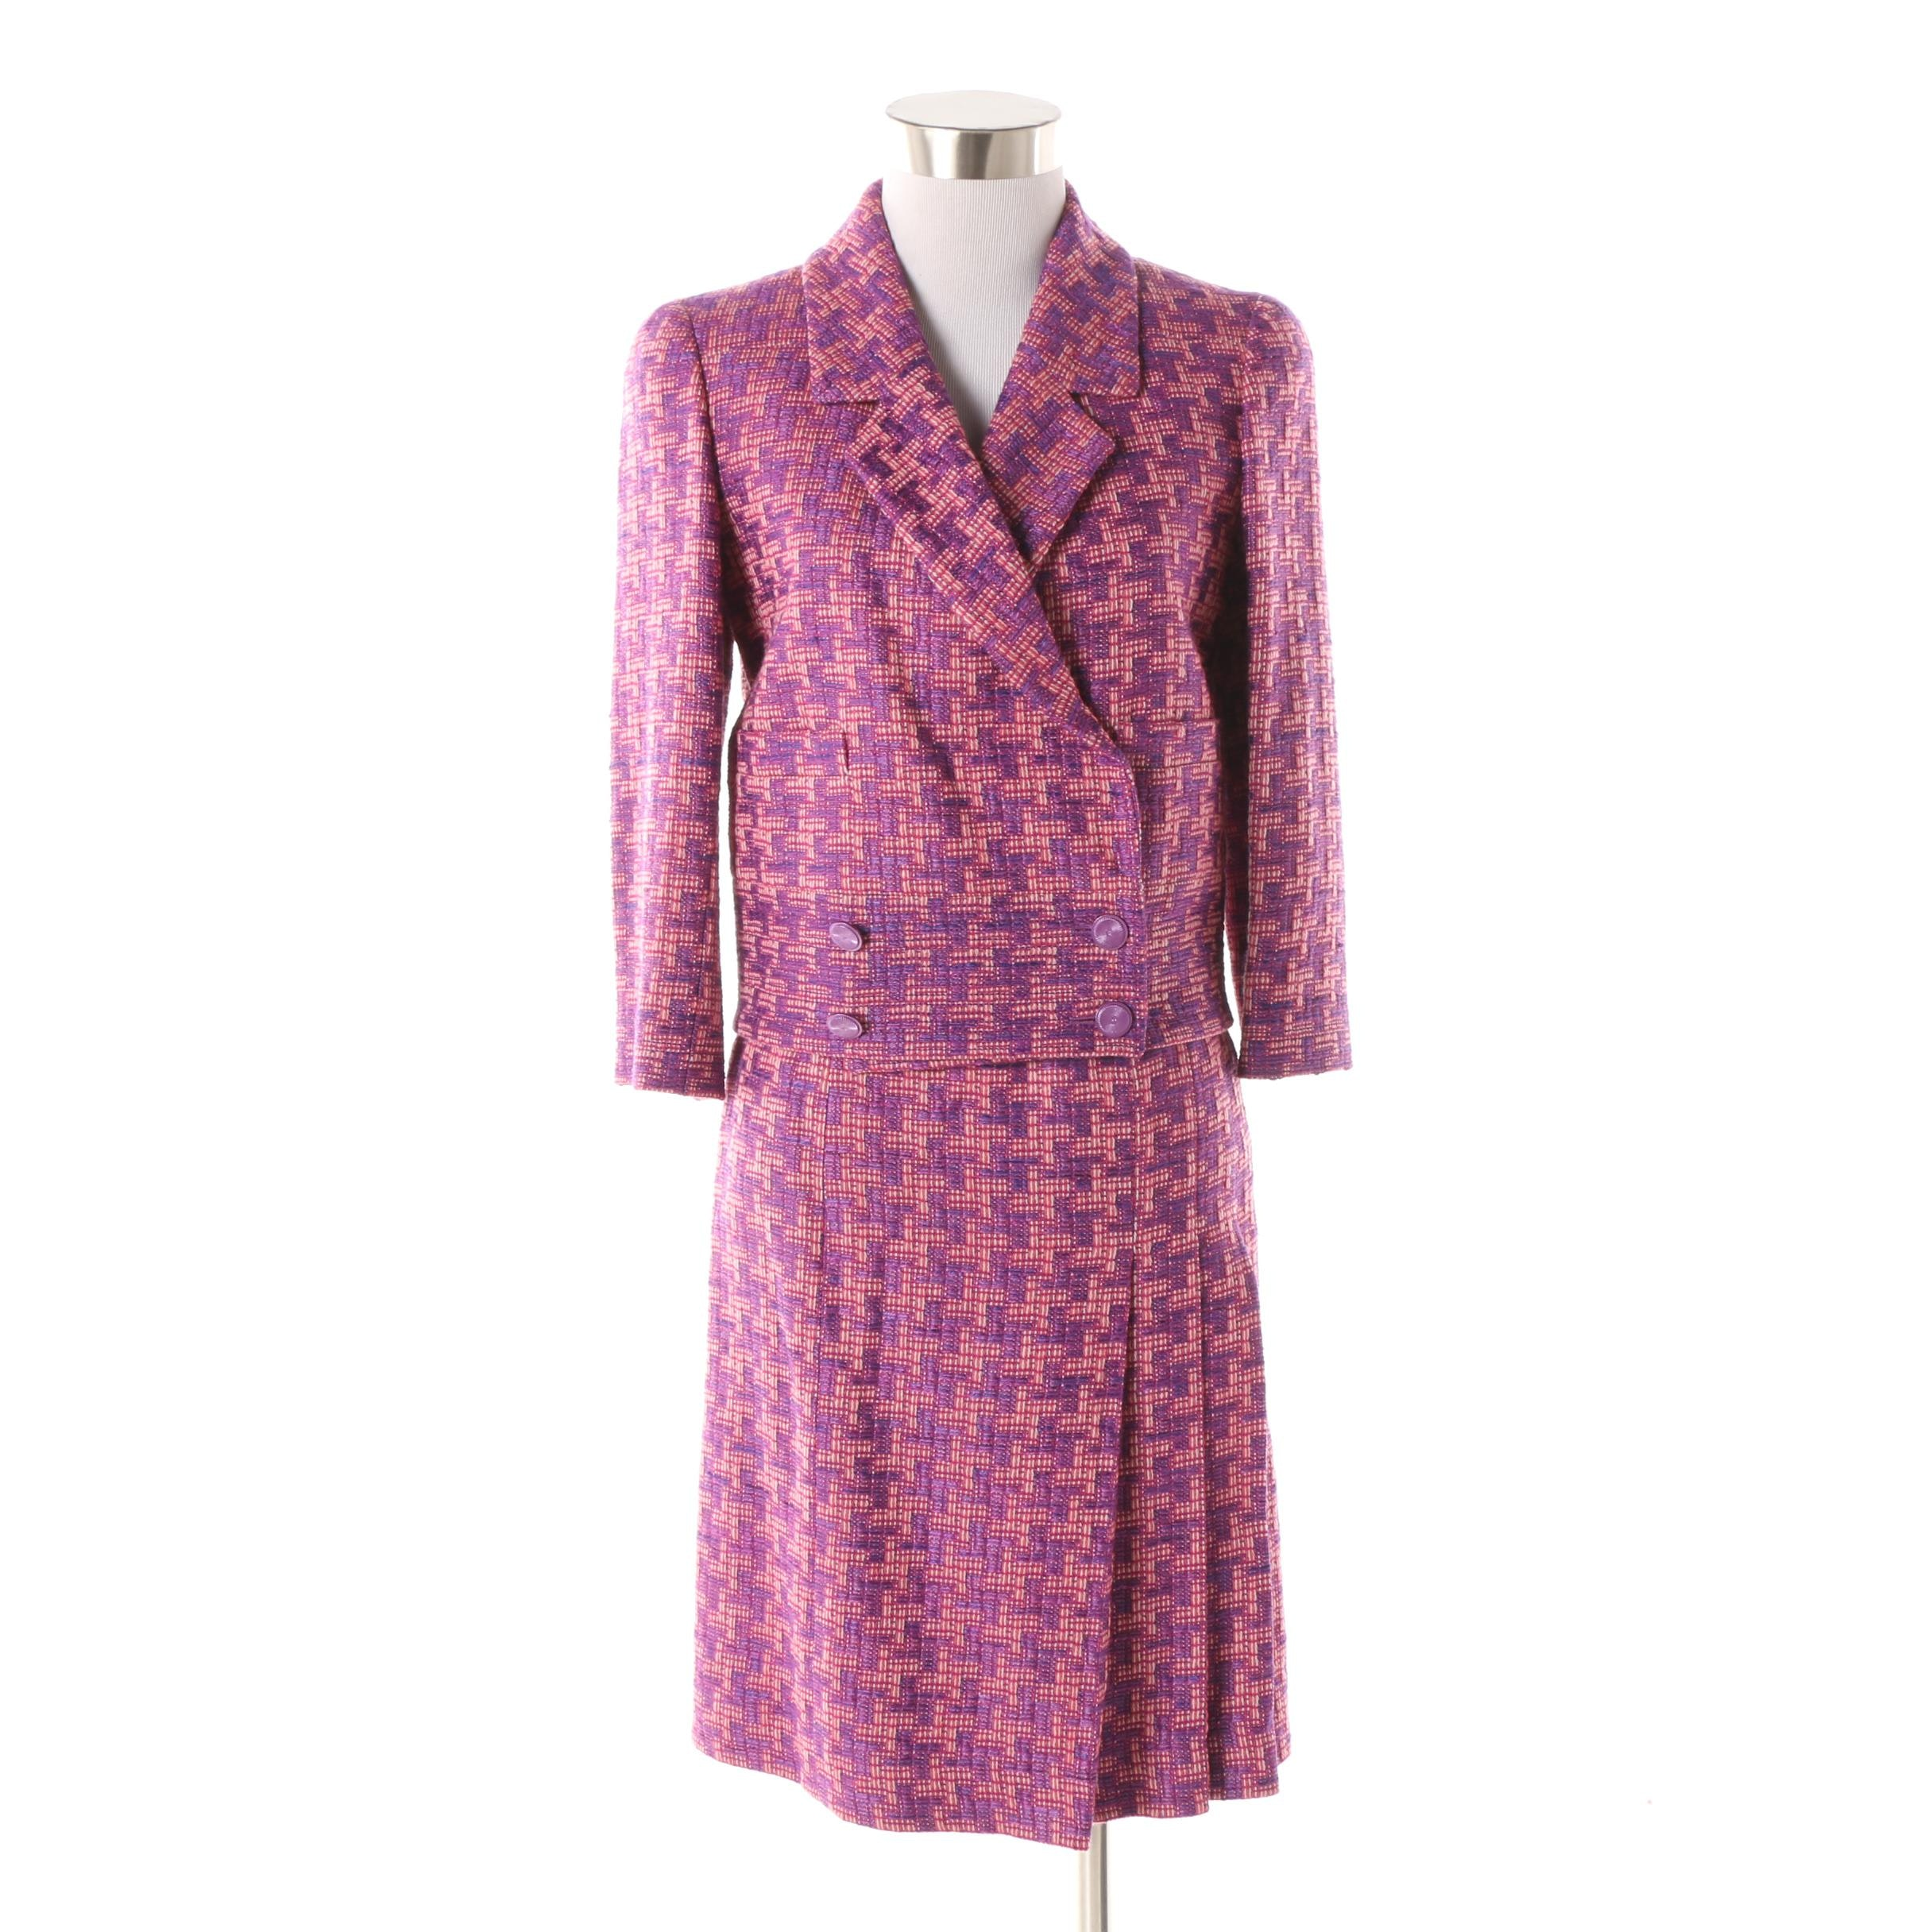 Chanel Pink and Purple Wool Blend Tweed Skirt Suit